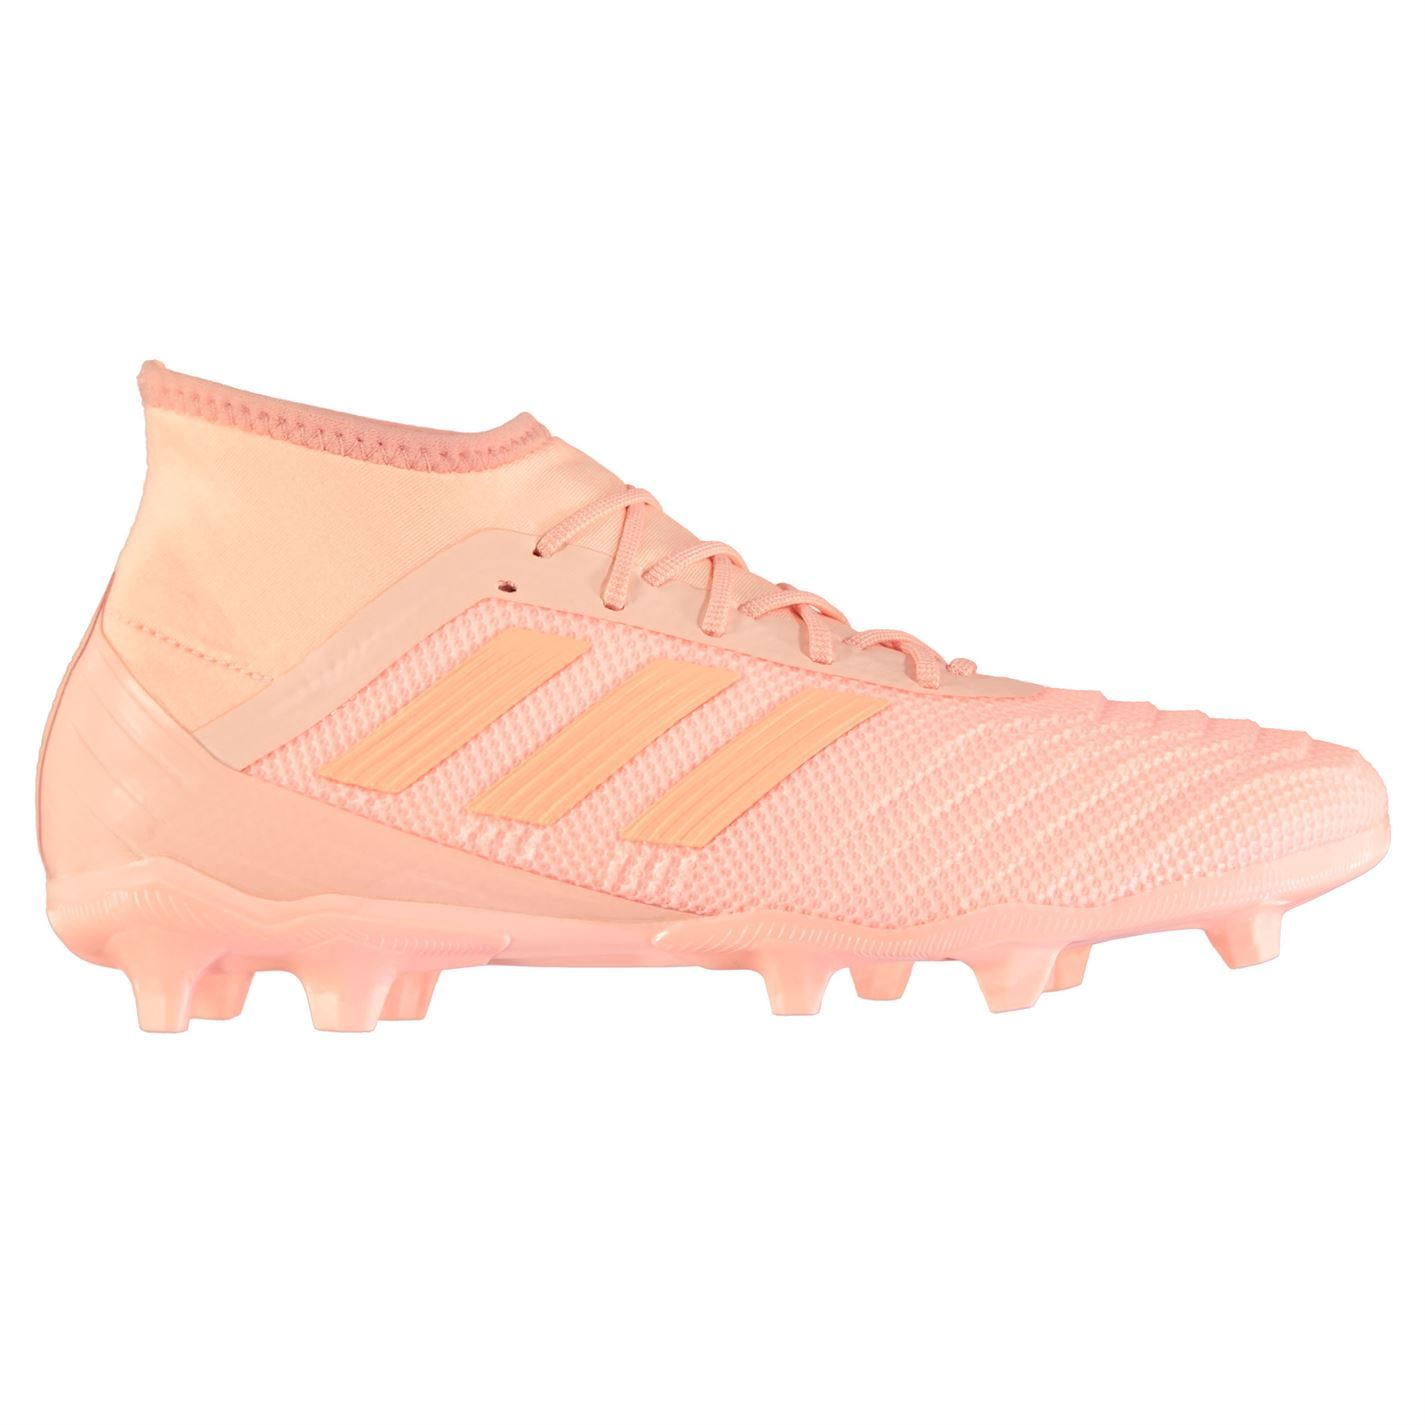 Adidas-Predator-18-2-FG-Firm-Ground-Chaussures-De-Football-Homme-Football-Chaussures-Crampons miniature 7